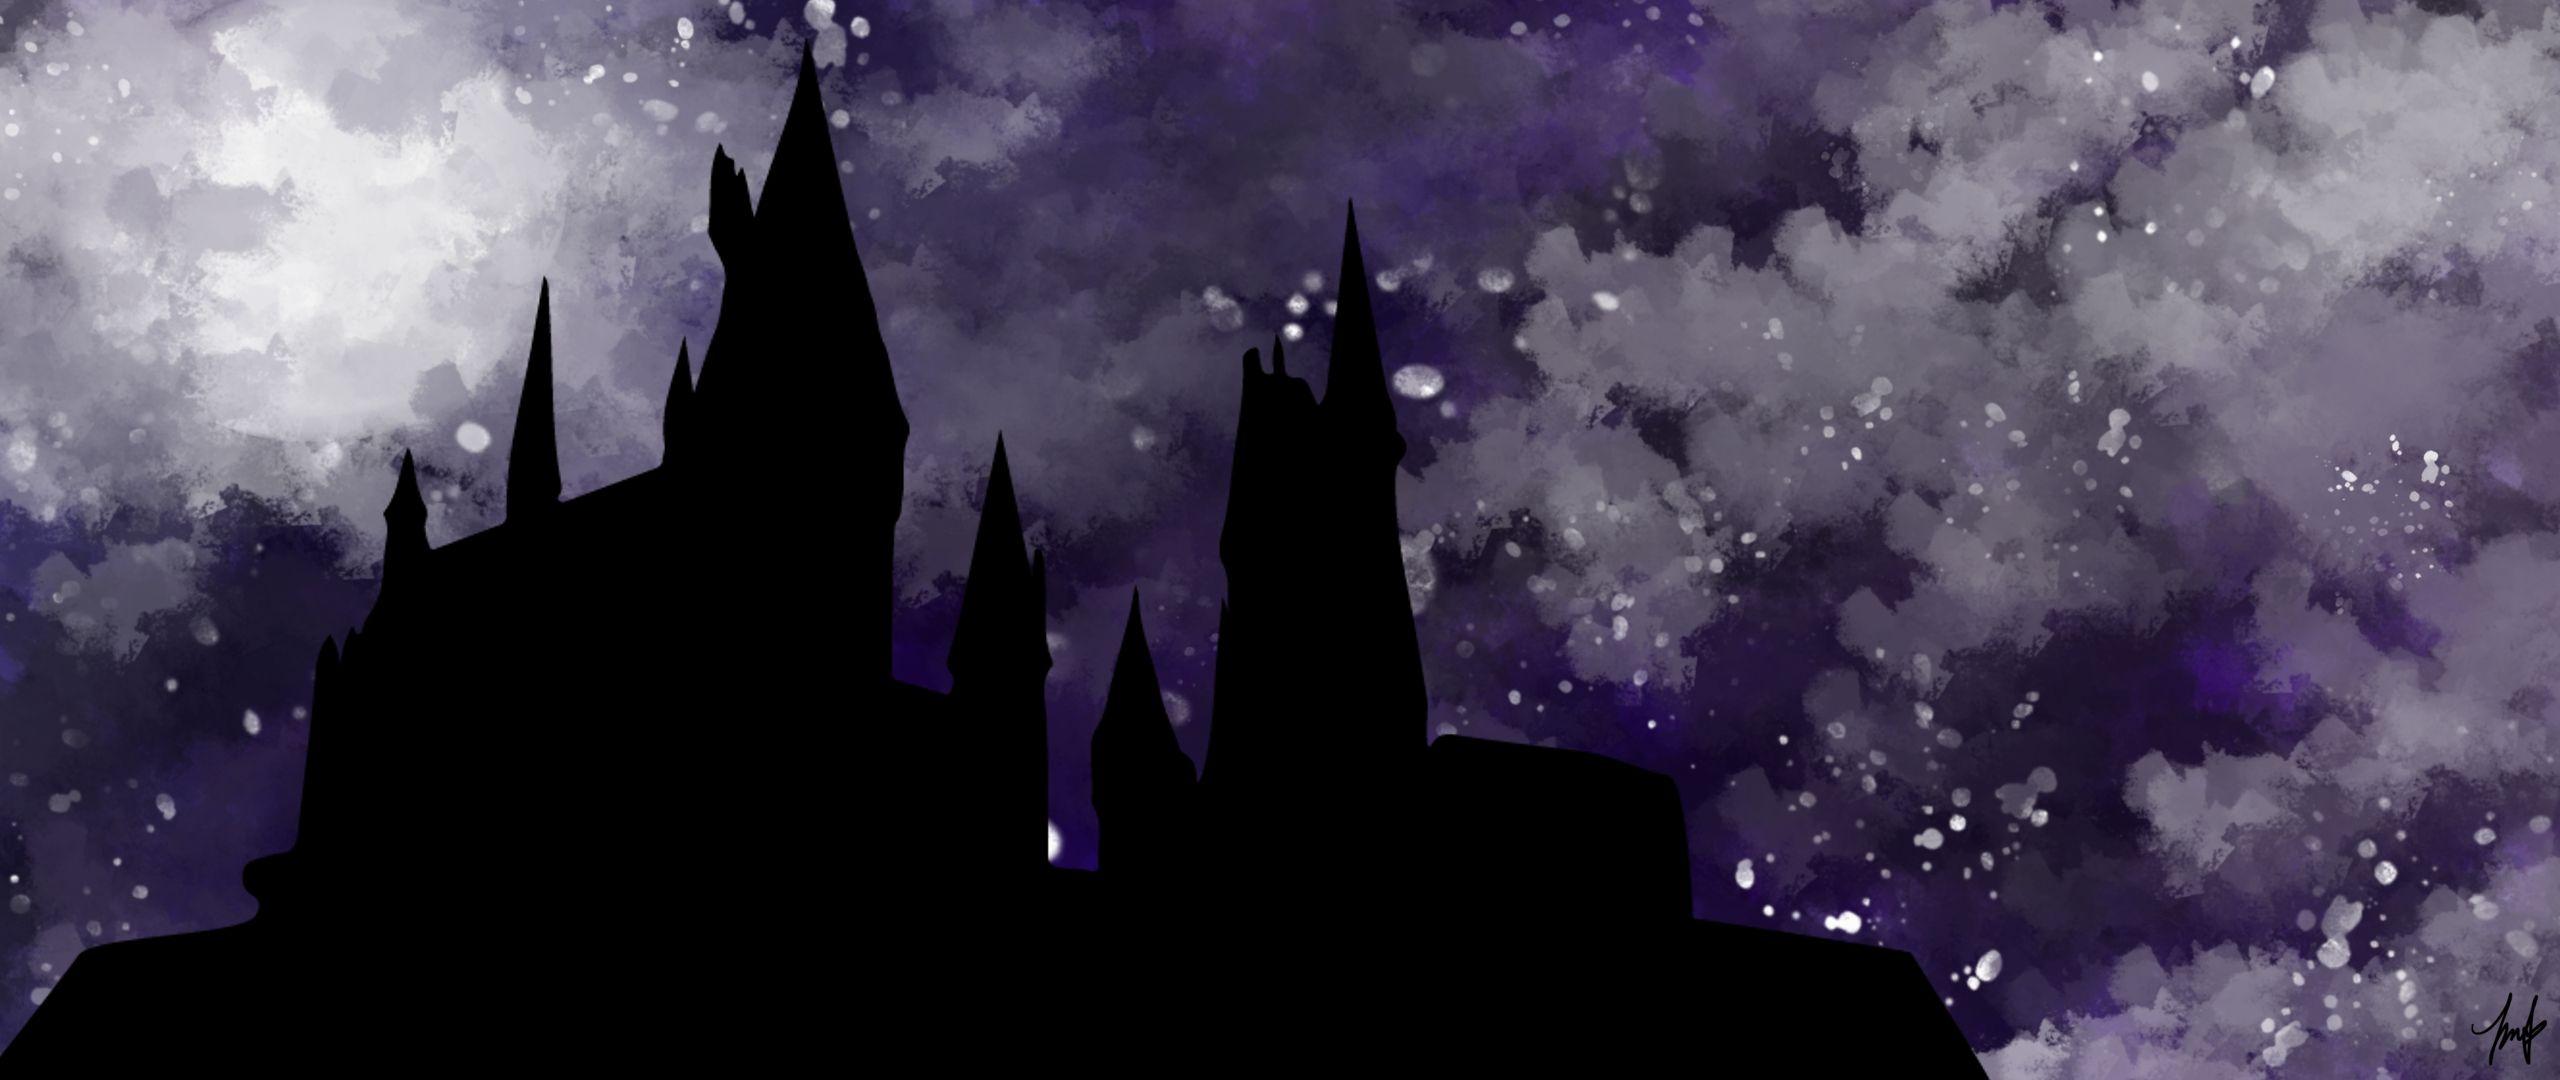 Hogwarts Castle Wallpapers Wallpaper Cave Desktop Wallpaper Harry Potter Harry Potter Wallpaper Backgrounds Harry Potter Background